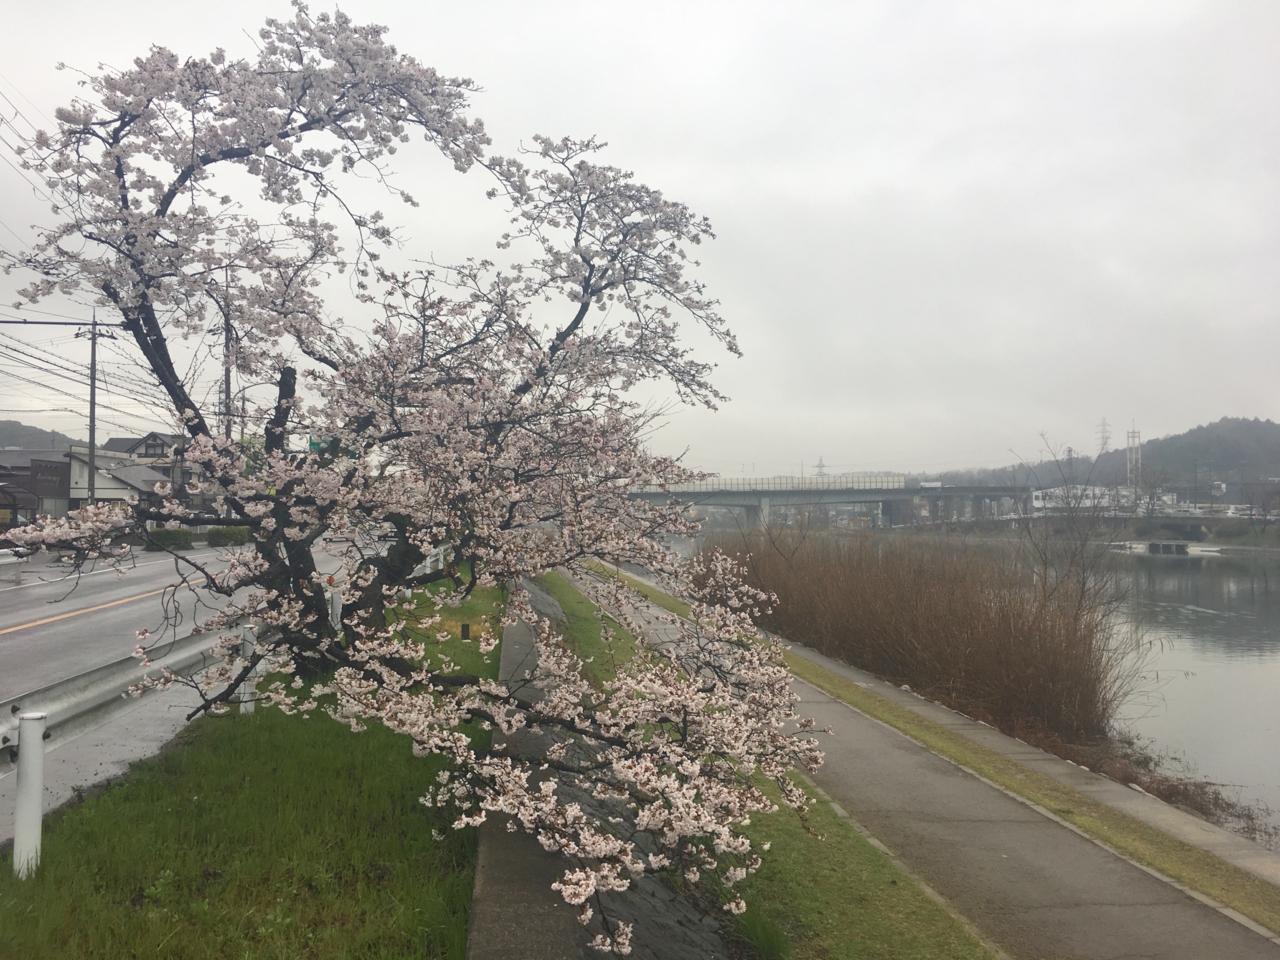 f:id:takatakamanbou:20170408224540j:plain